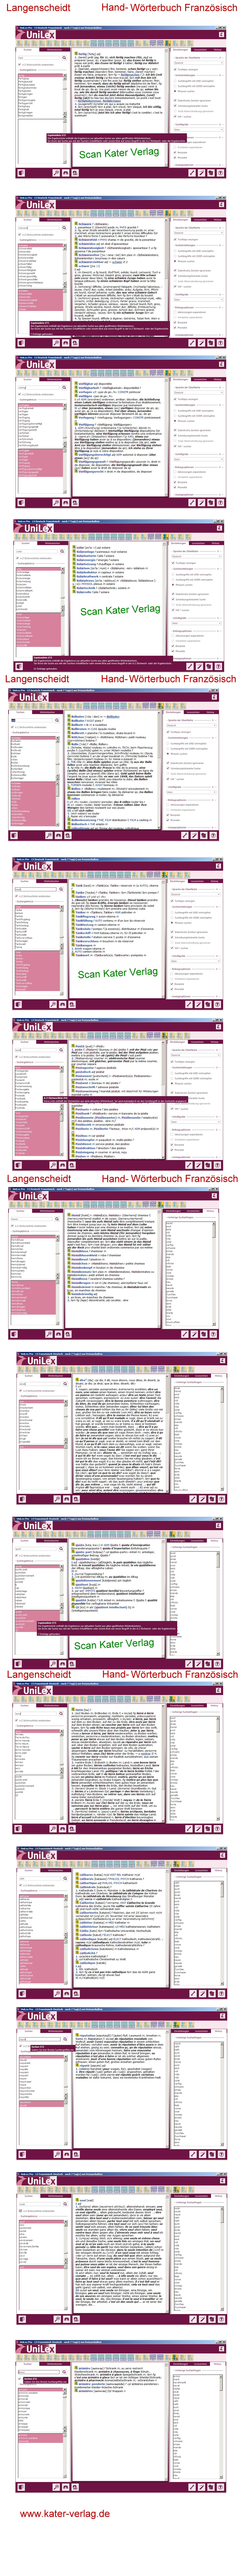 Langenscheidt Französisch Professional DE-FR, FR-DE Update